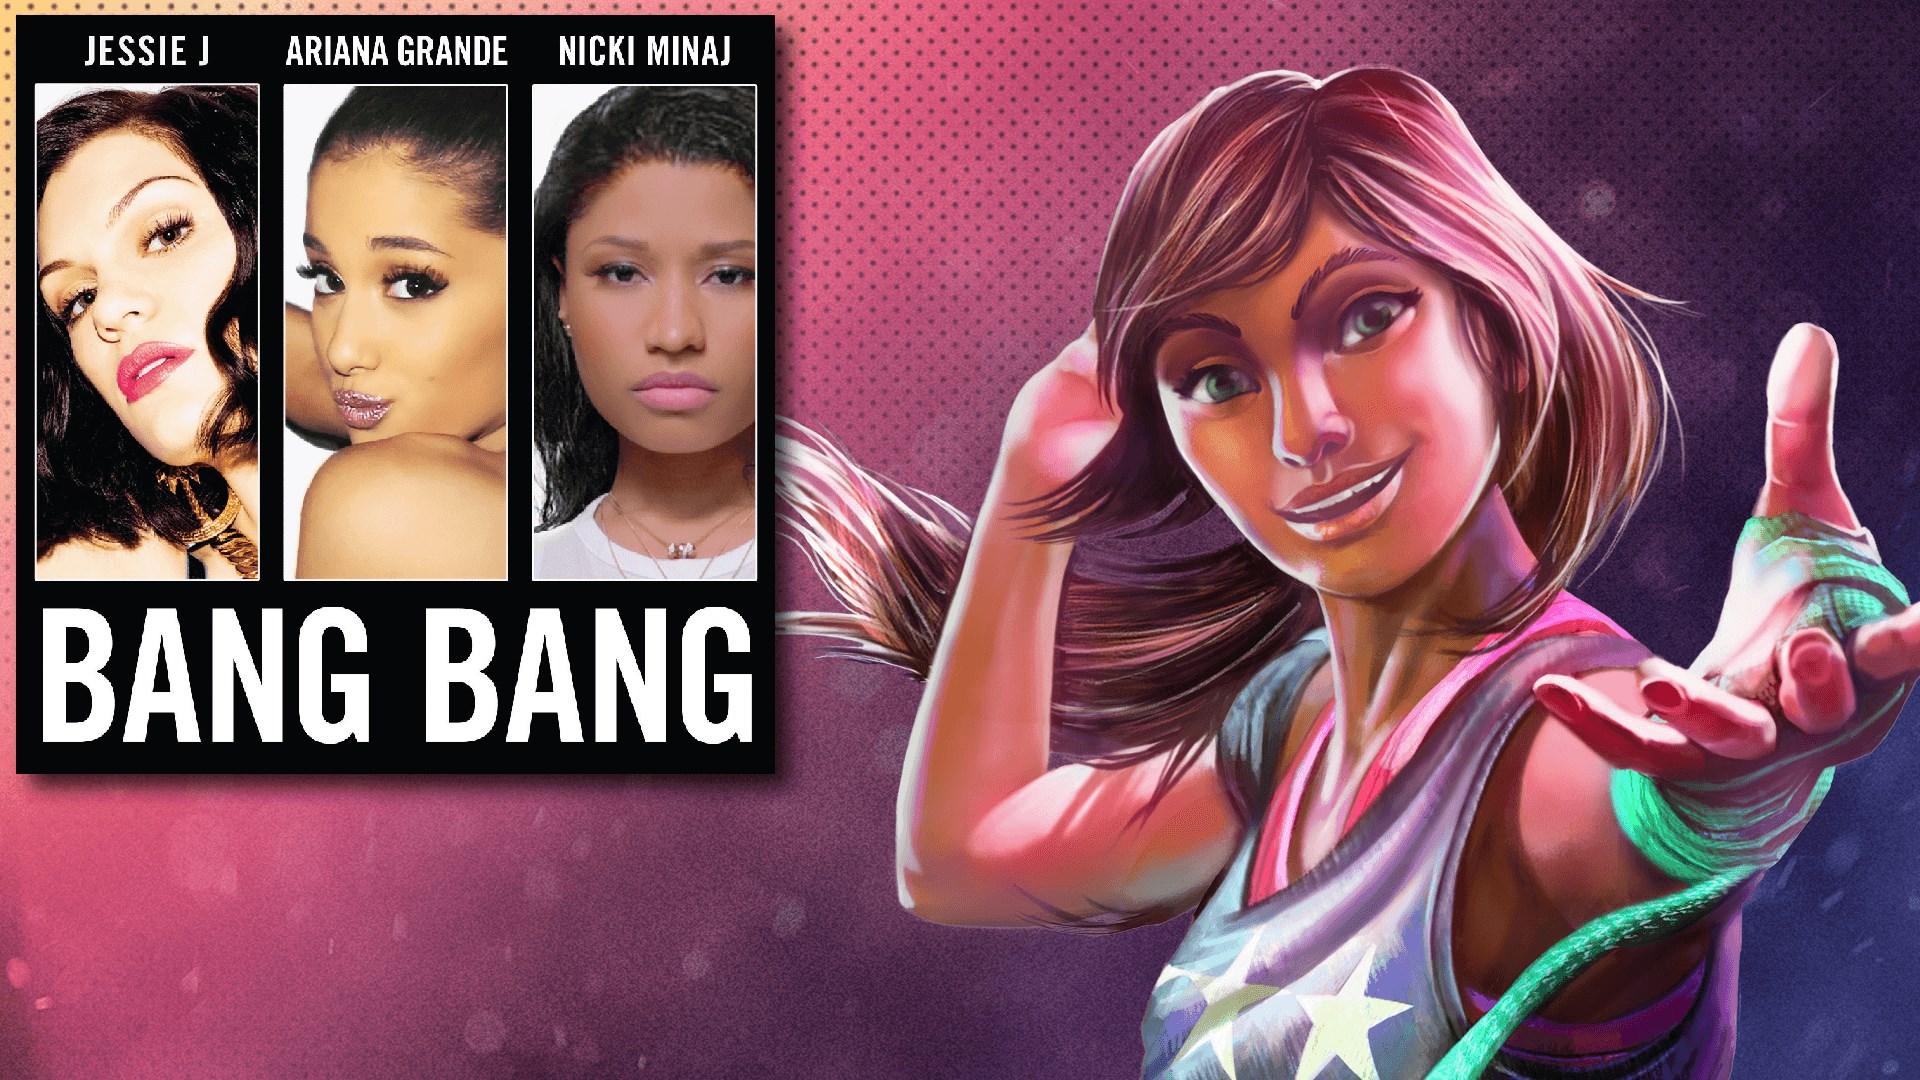 """Bang Bang"" - Jessie J, Ariana Grande, Nicki Minaj"